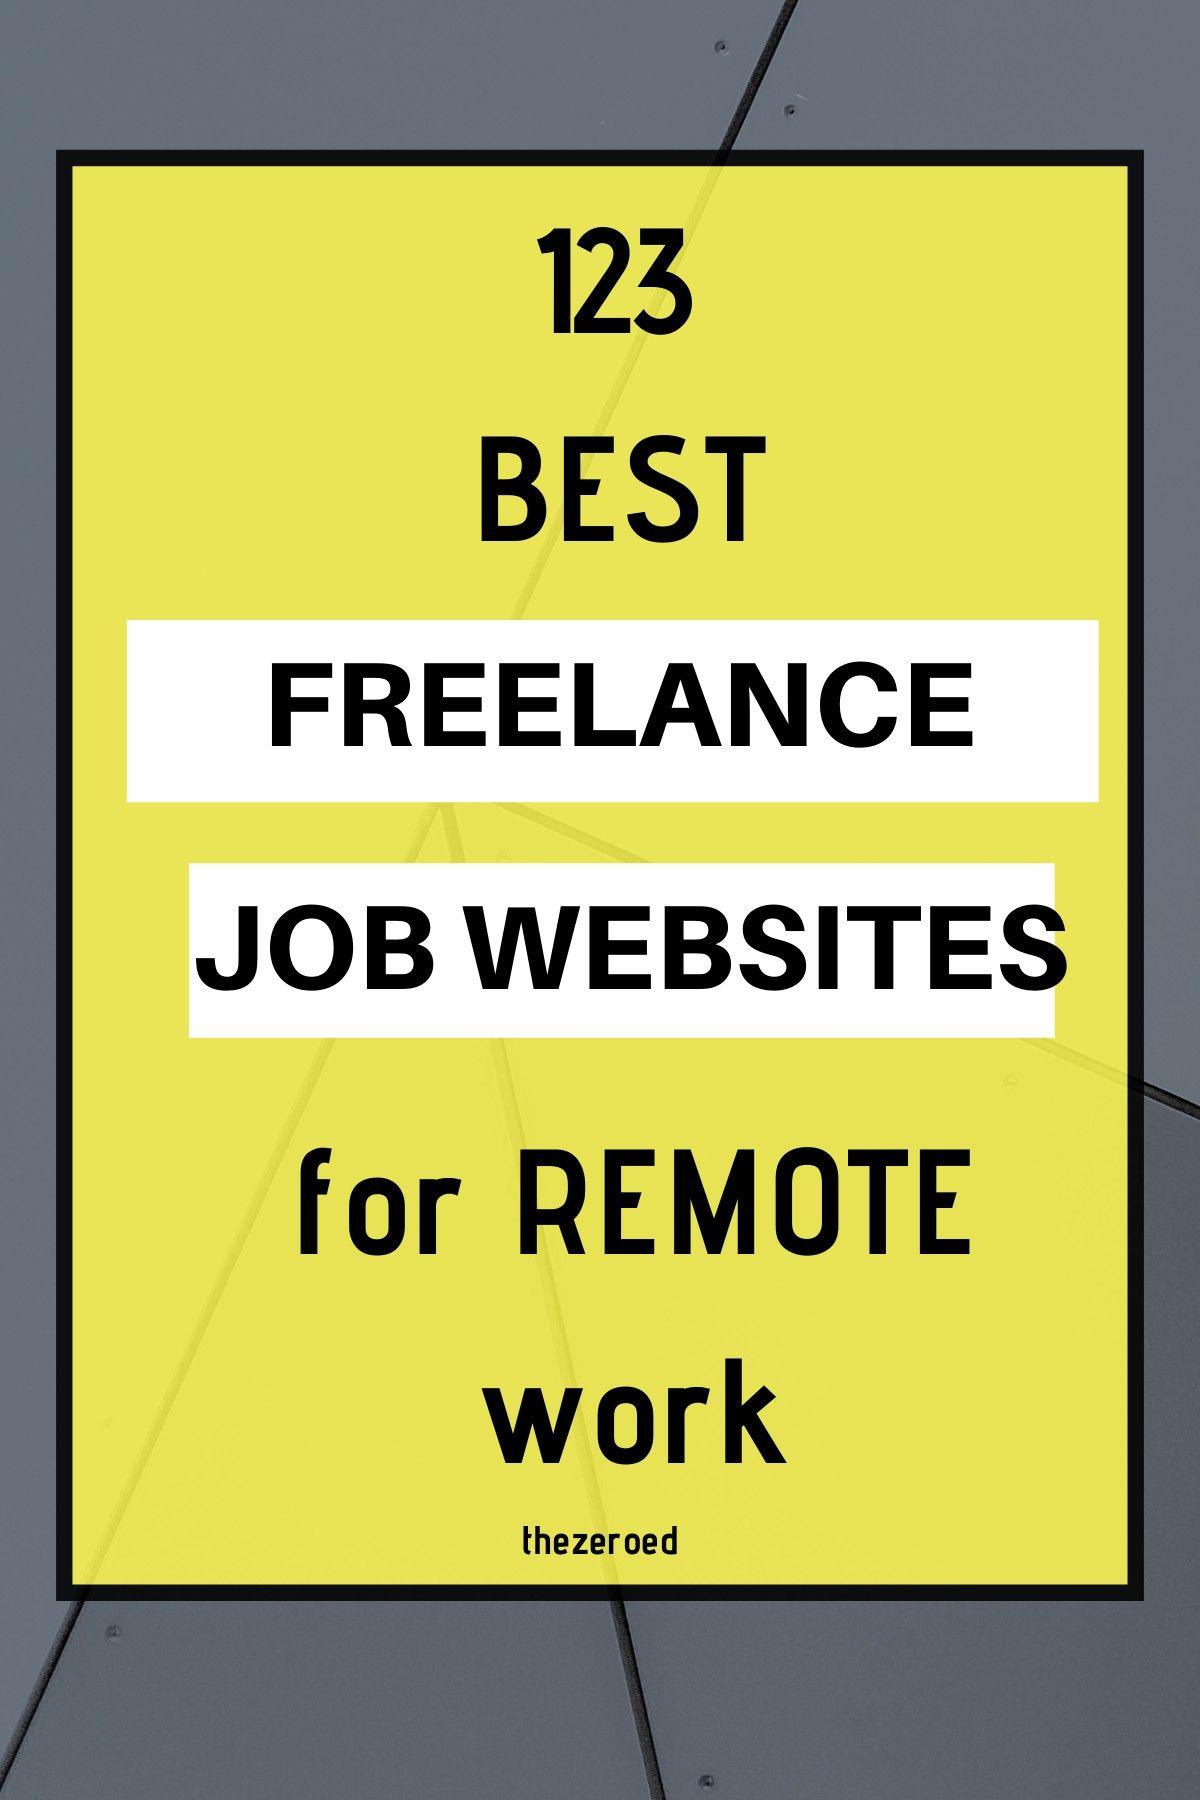 123 Best Freelance Job Websites For Remote Work in 2020